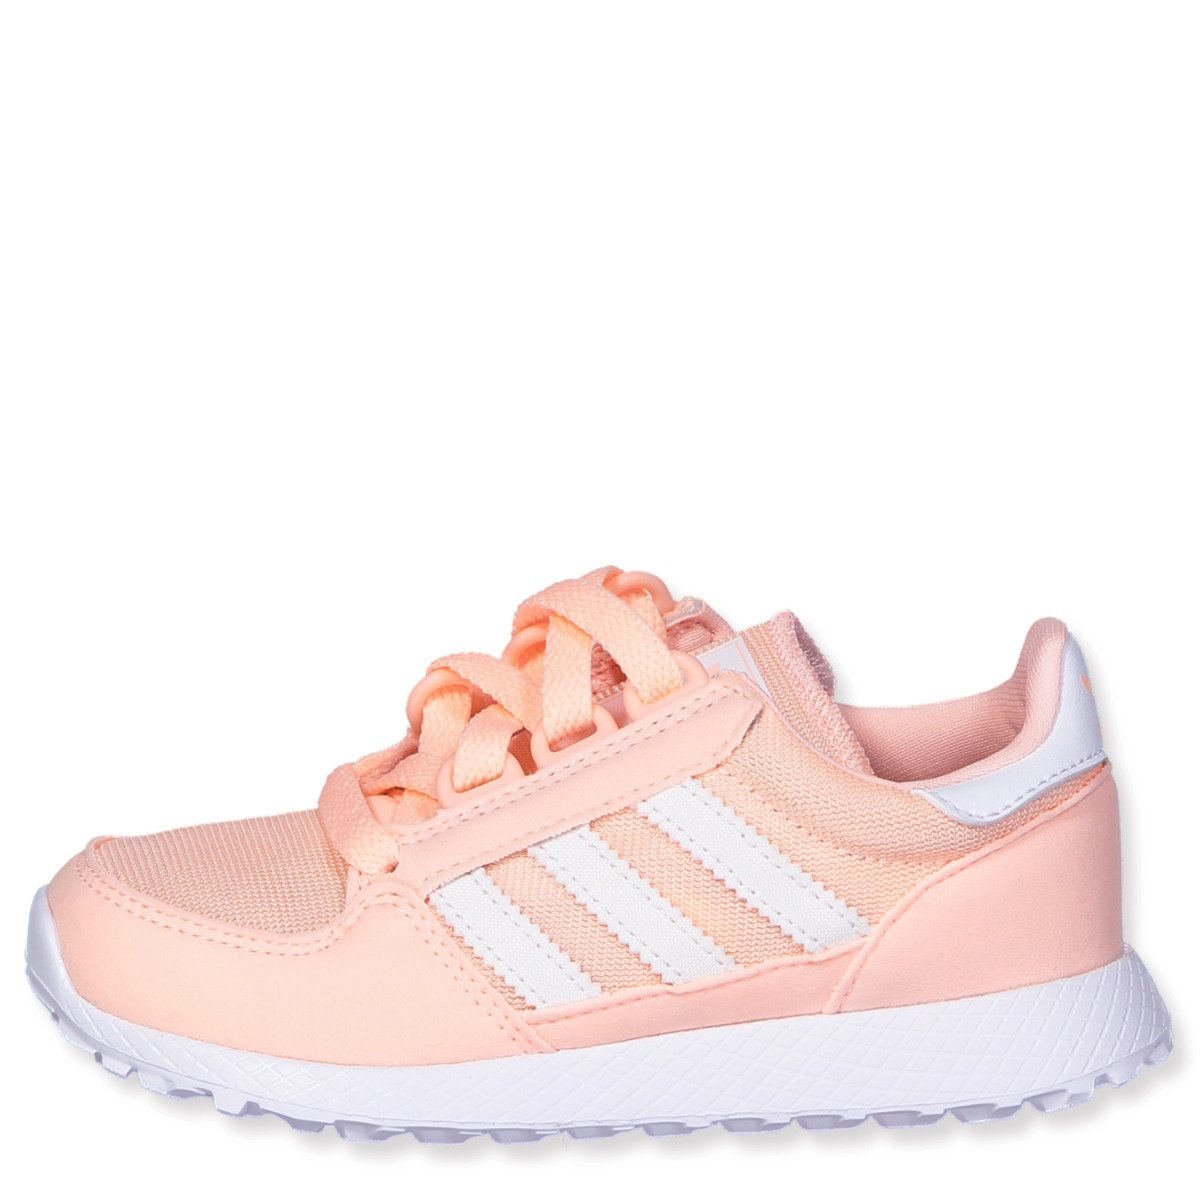 3ce0f608cc5 Adidas Originals - Forest Grove C sneakers